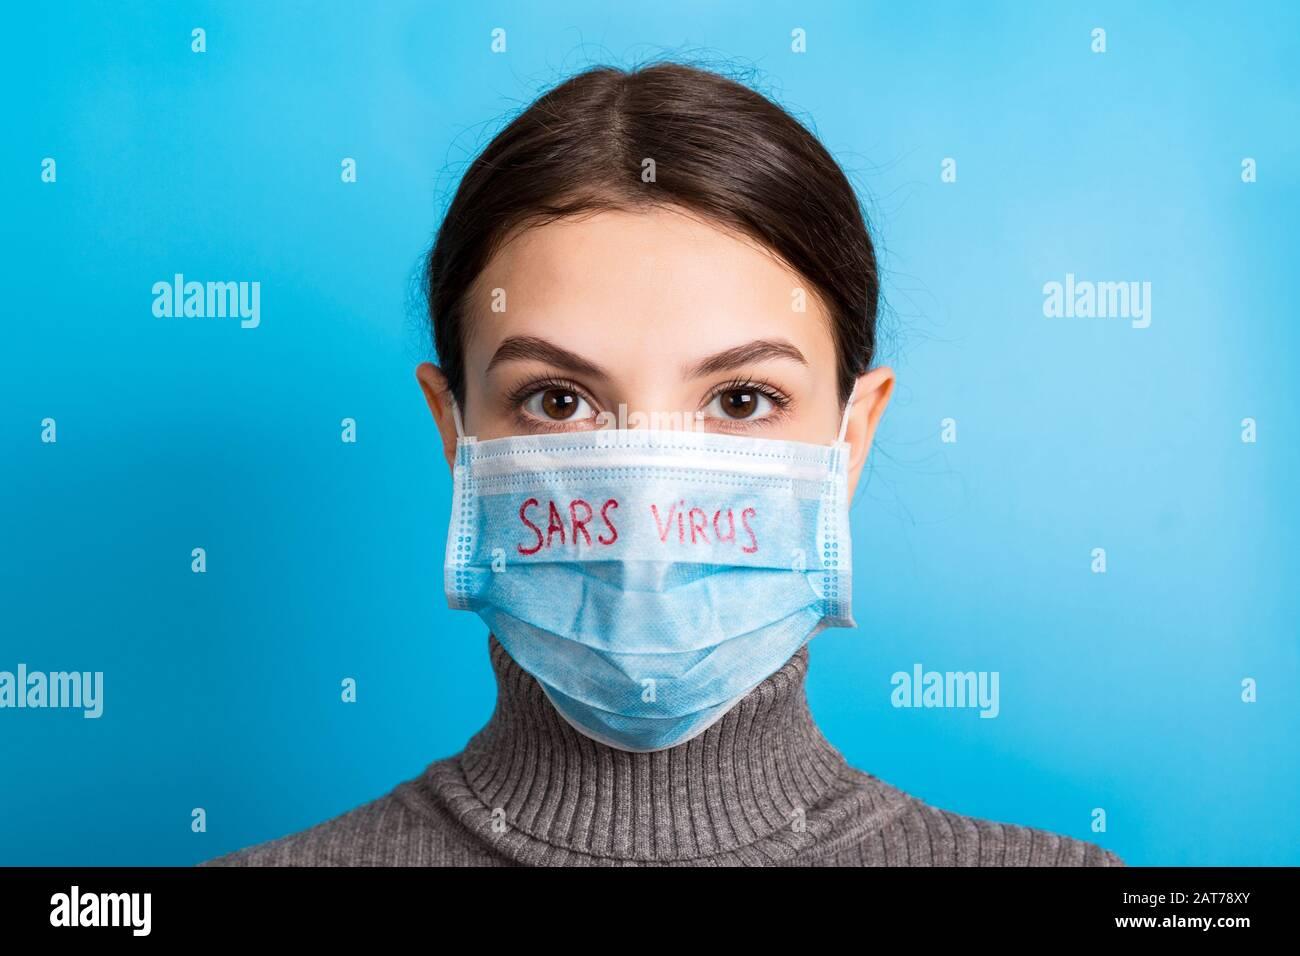 medical mask virus